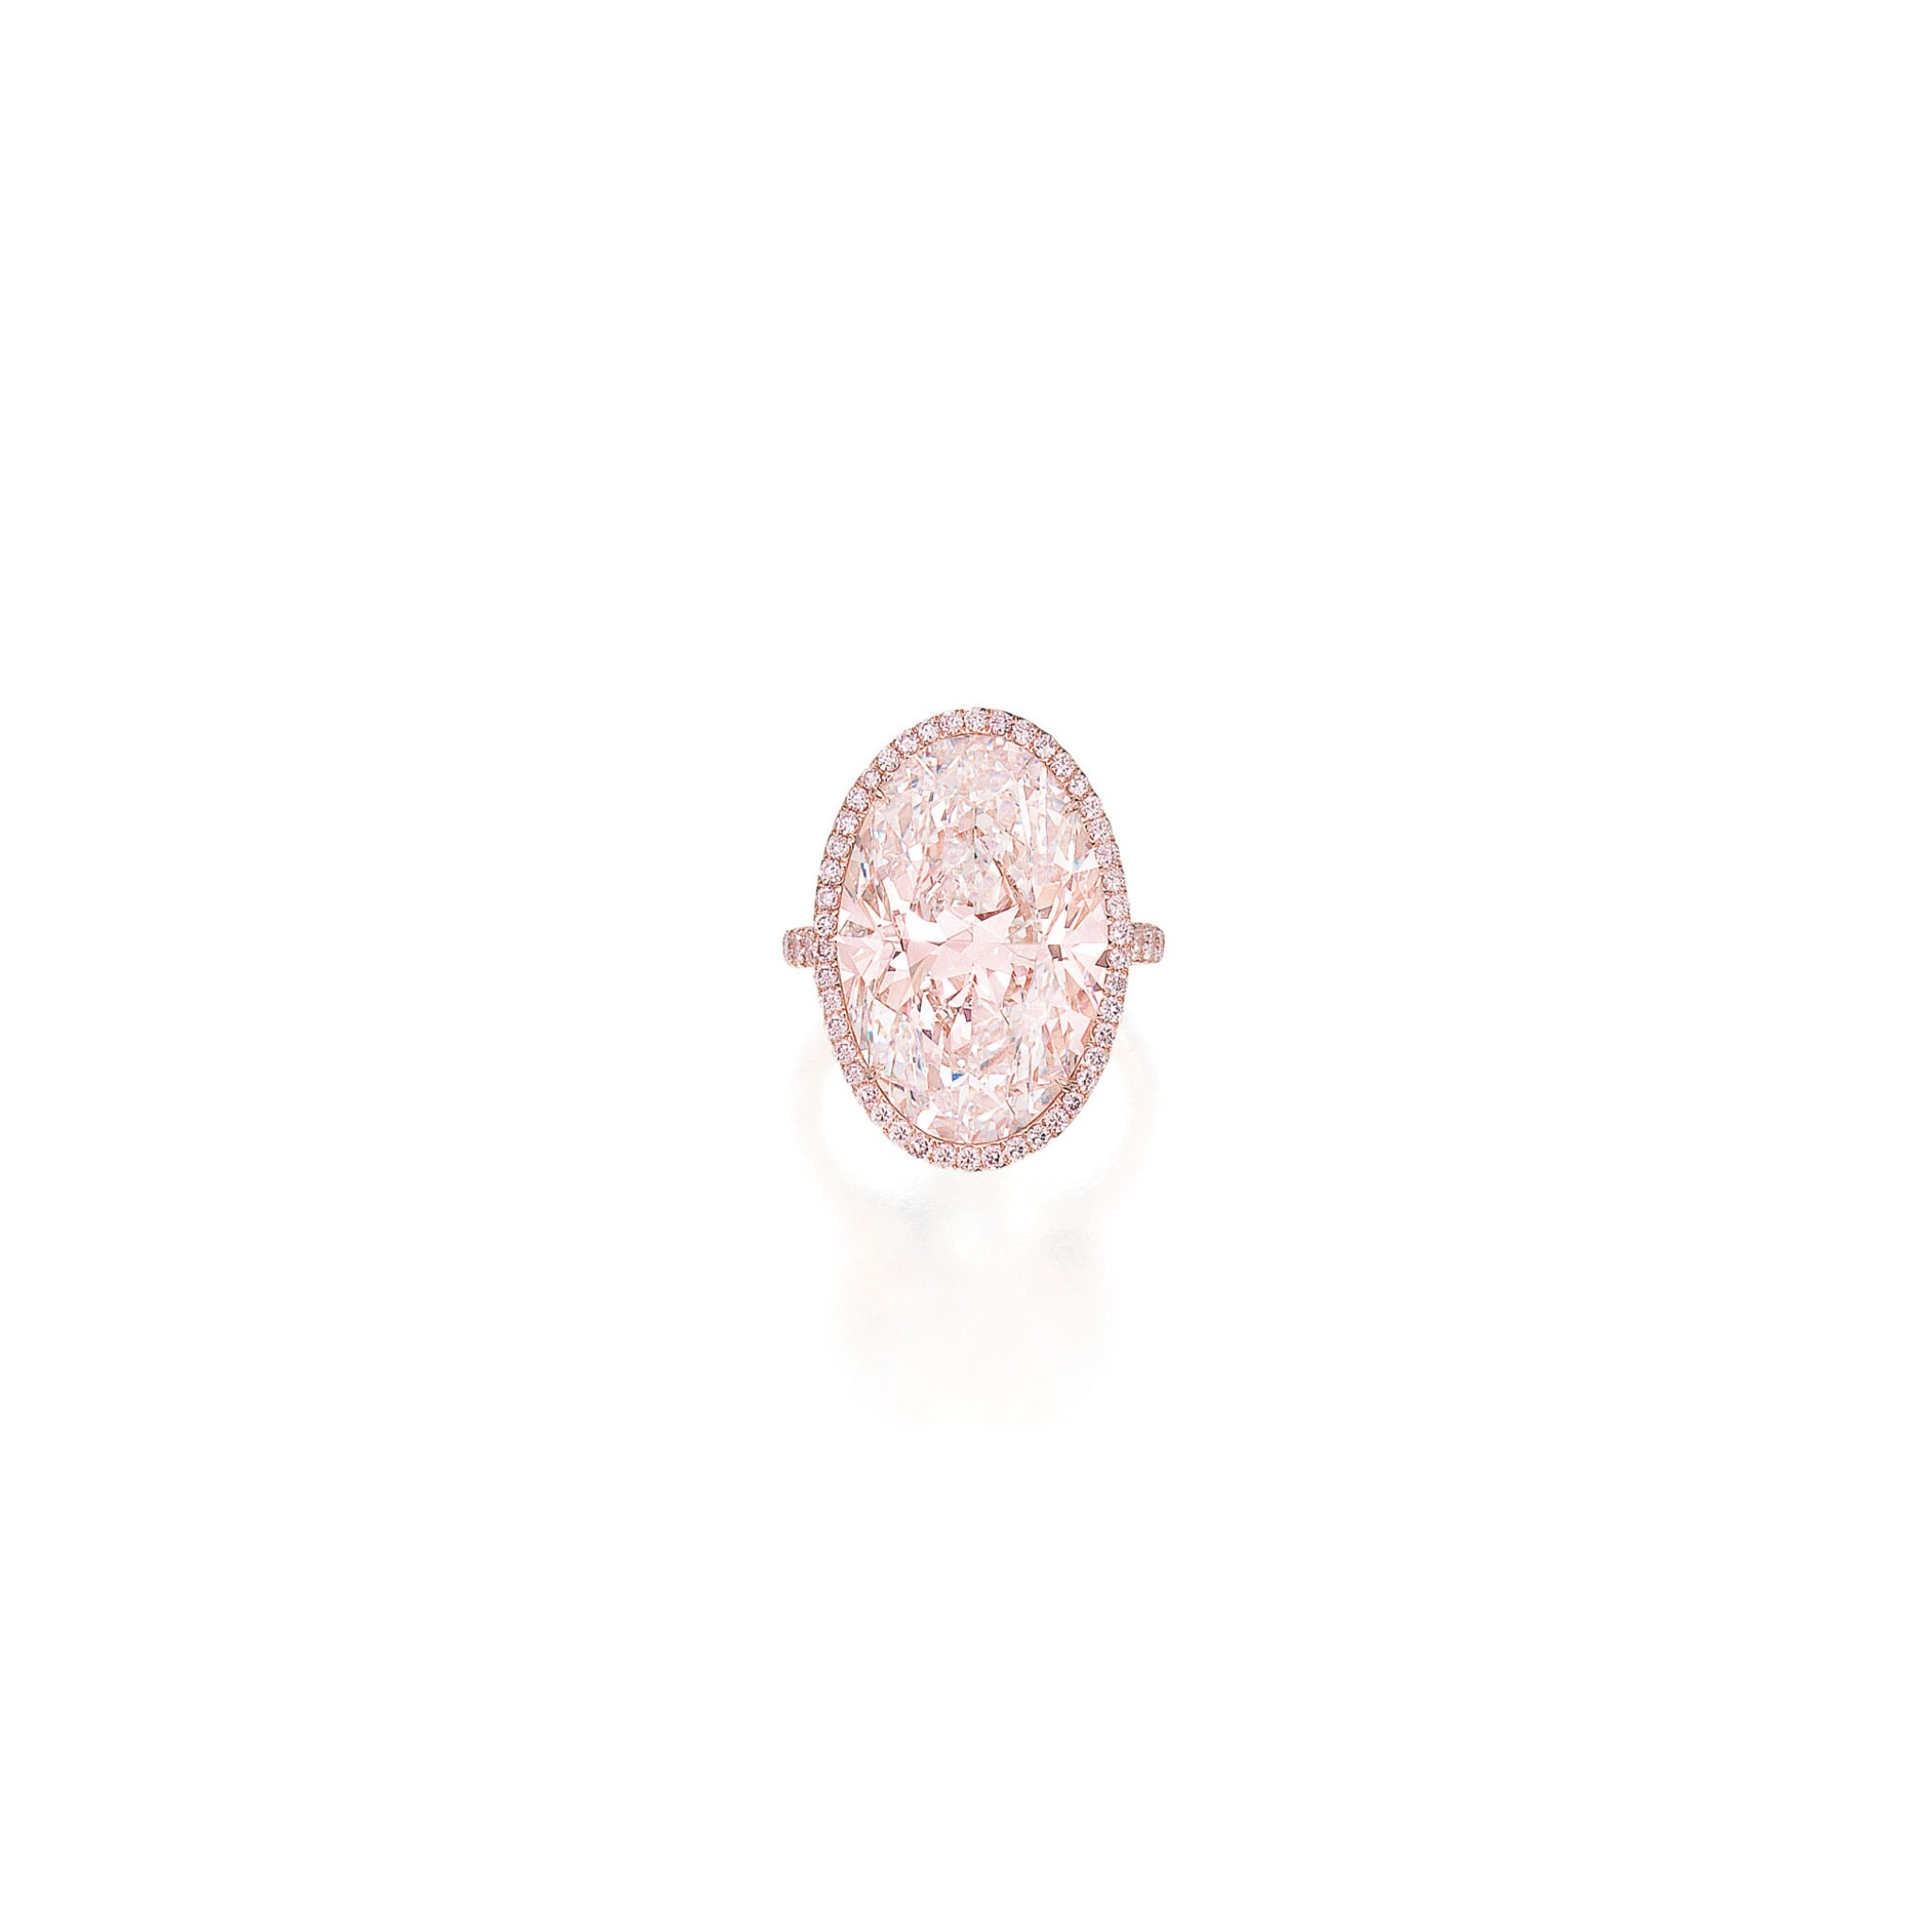 View full screen - View 1 of Lot 419. AN IMPRESSIVE FAINT PINK DIAMOND AND COLORED DIAMOND RING | 微粉紅色鑽石配彩色鑽石戒指一枚.